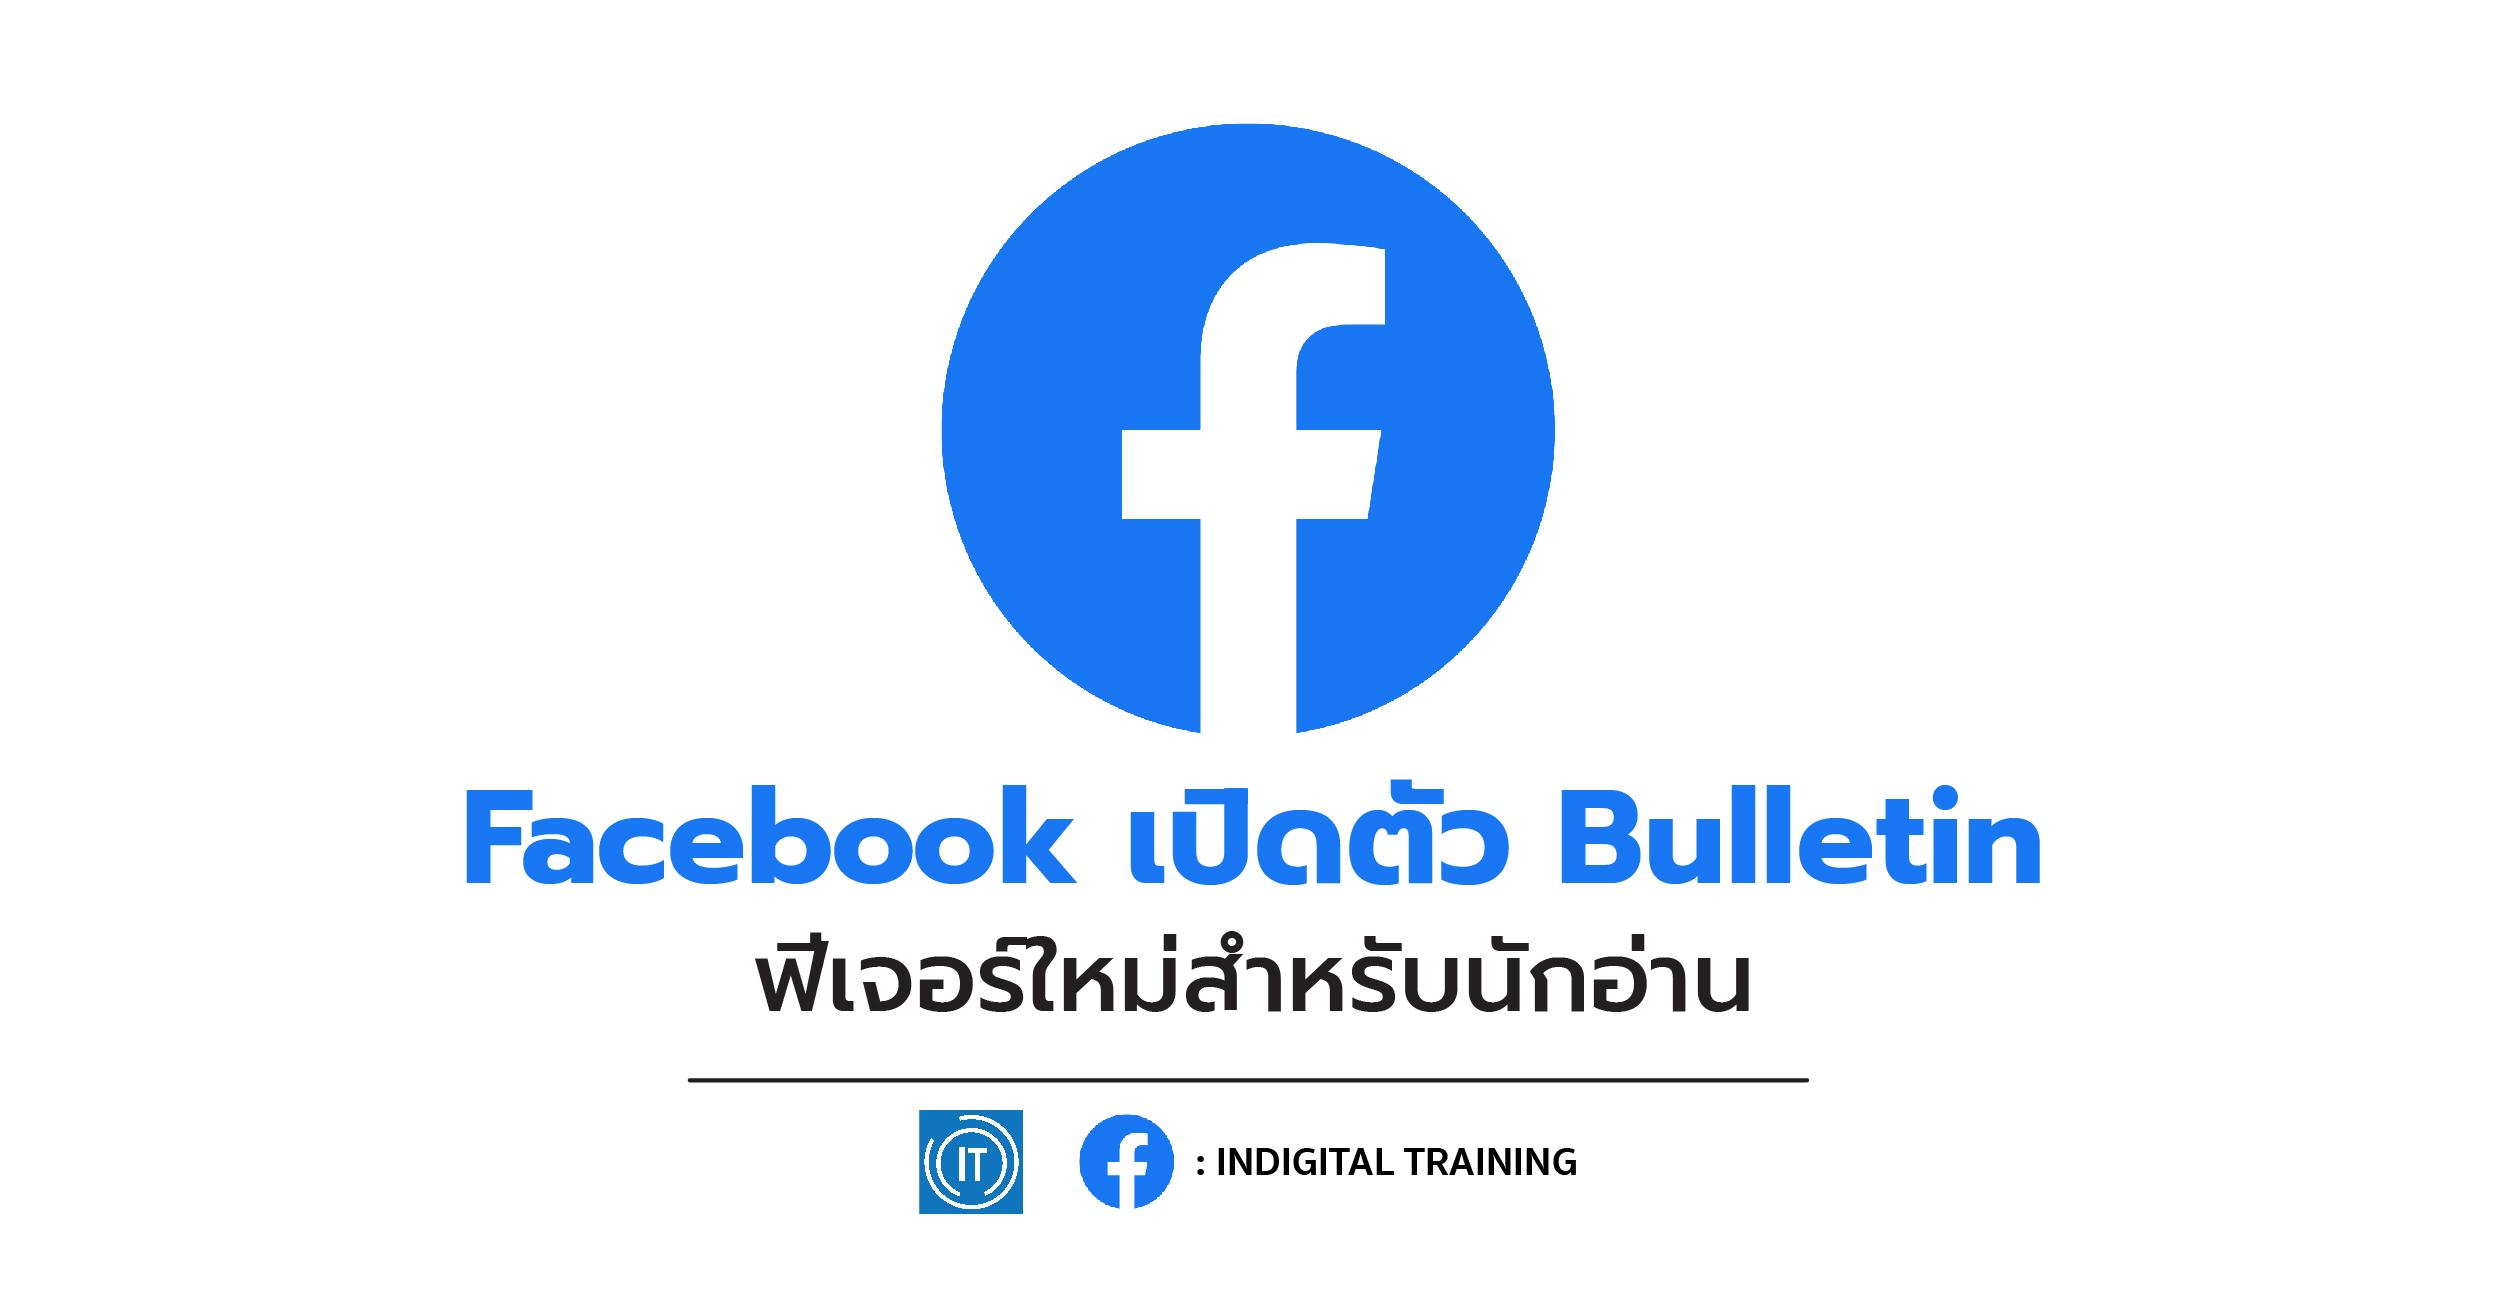 Facebook เปิดตัว Bulletin ฟีเจอร์ใหม่สำหรับนักอ่าน